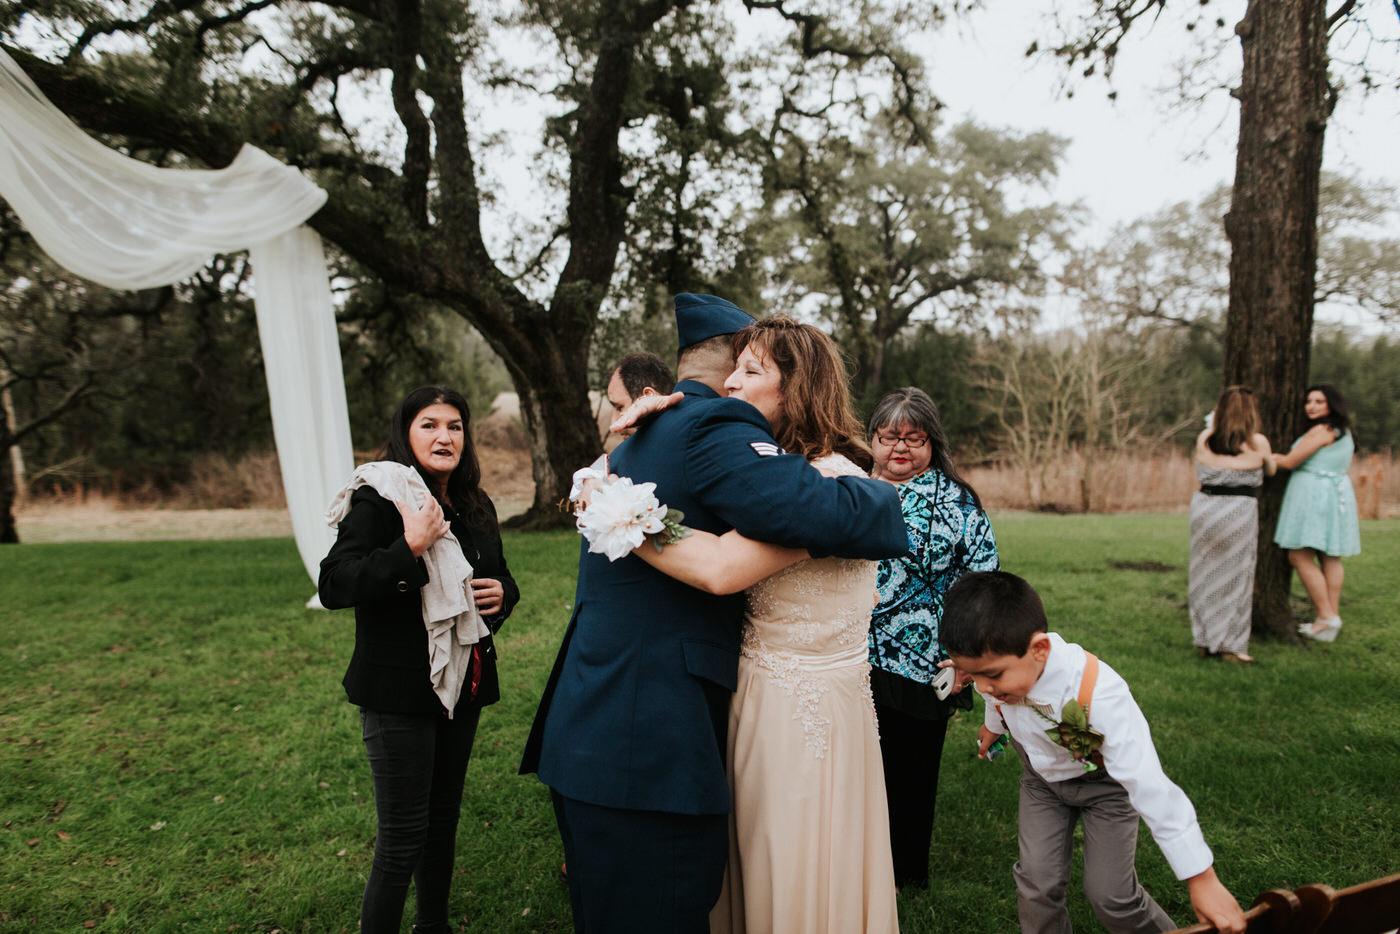 Wedding guests hugging at Pecan Springs Ranch